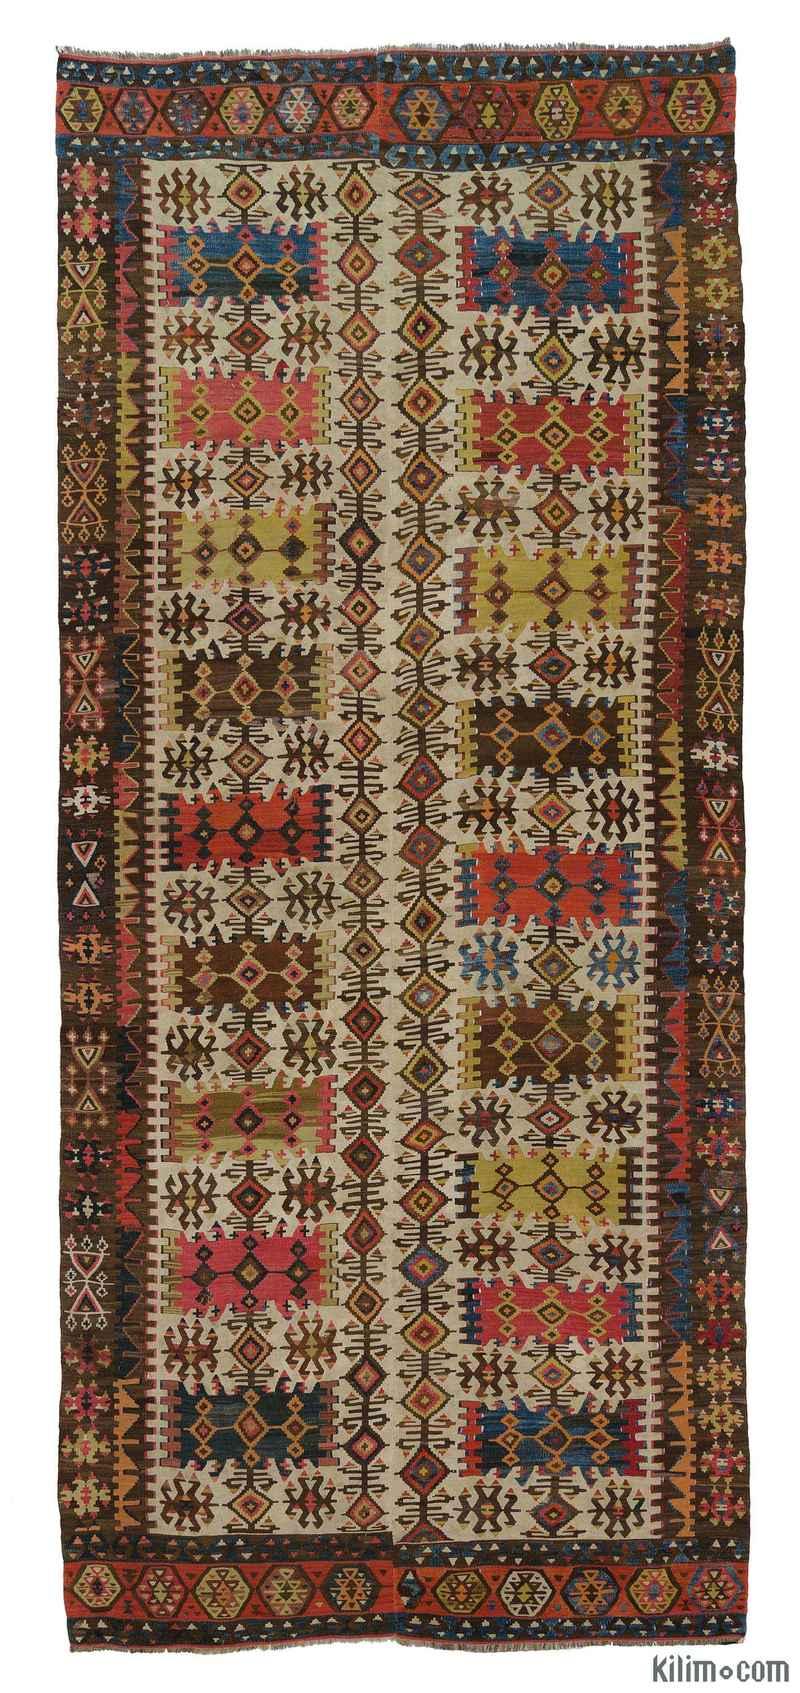 K0007937 Multicolor Antique Hotamis Kilim Rug